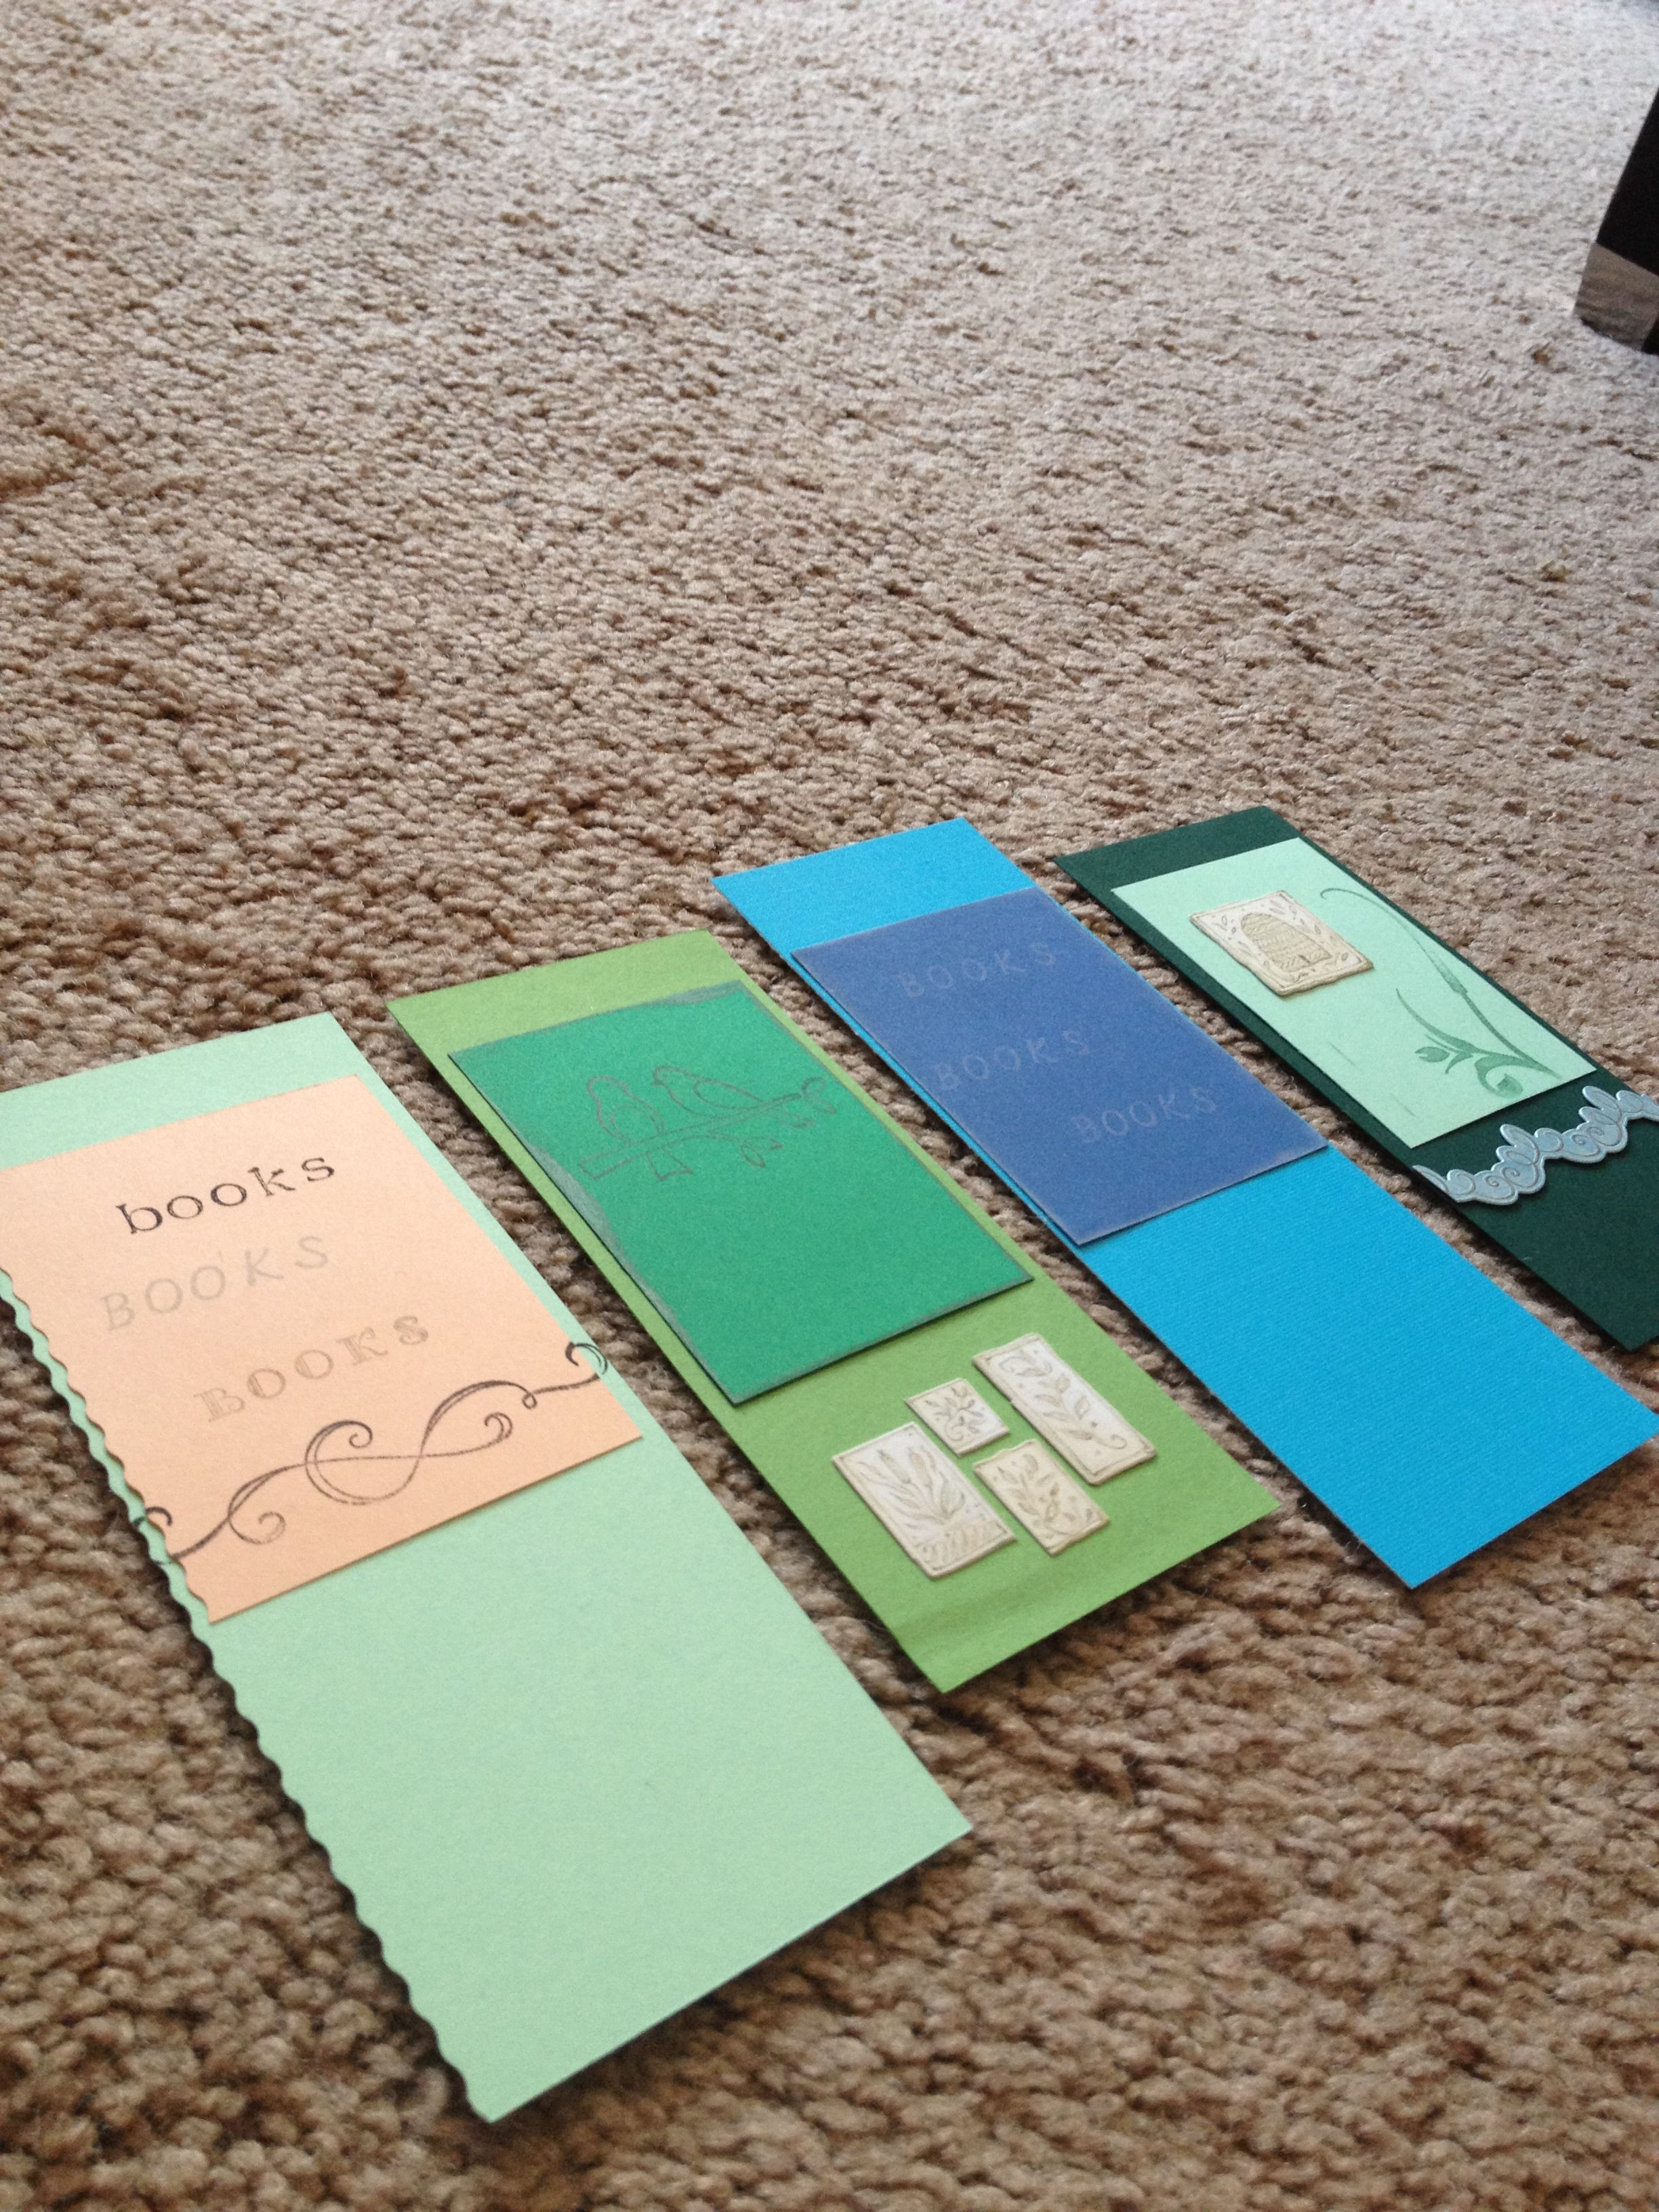 Diy bookmarks scrapbook pinterest bookmarks book crafts and diys diy bookmarks solutioingenieria Image collections